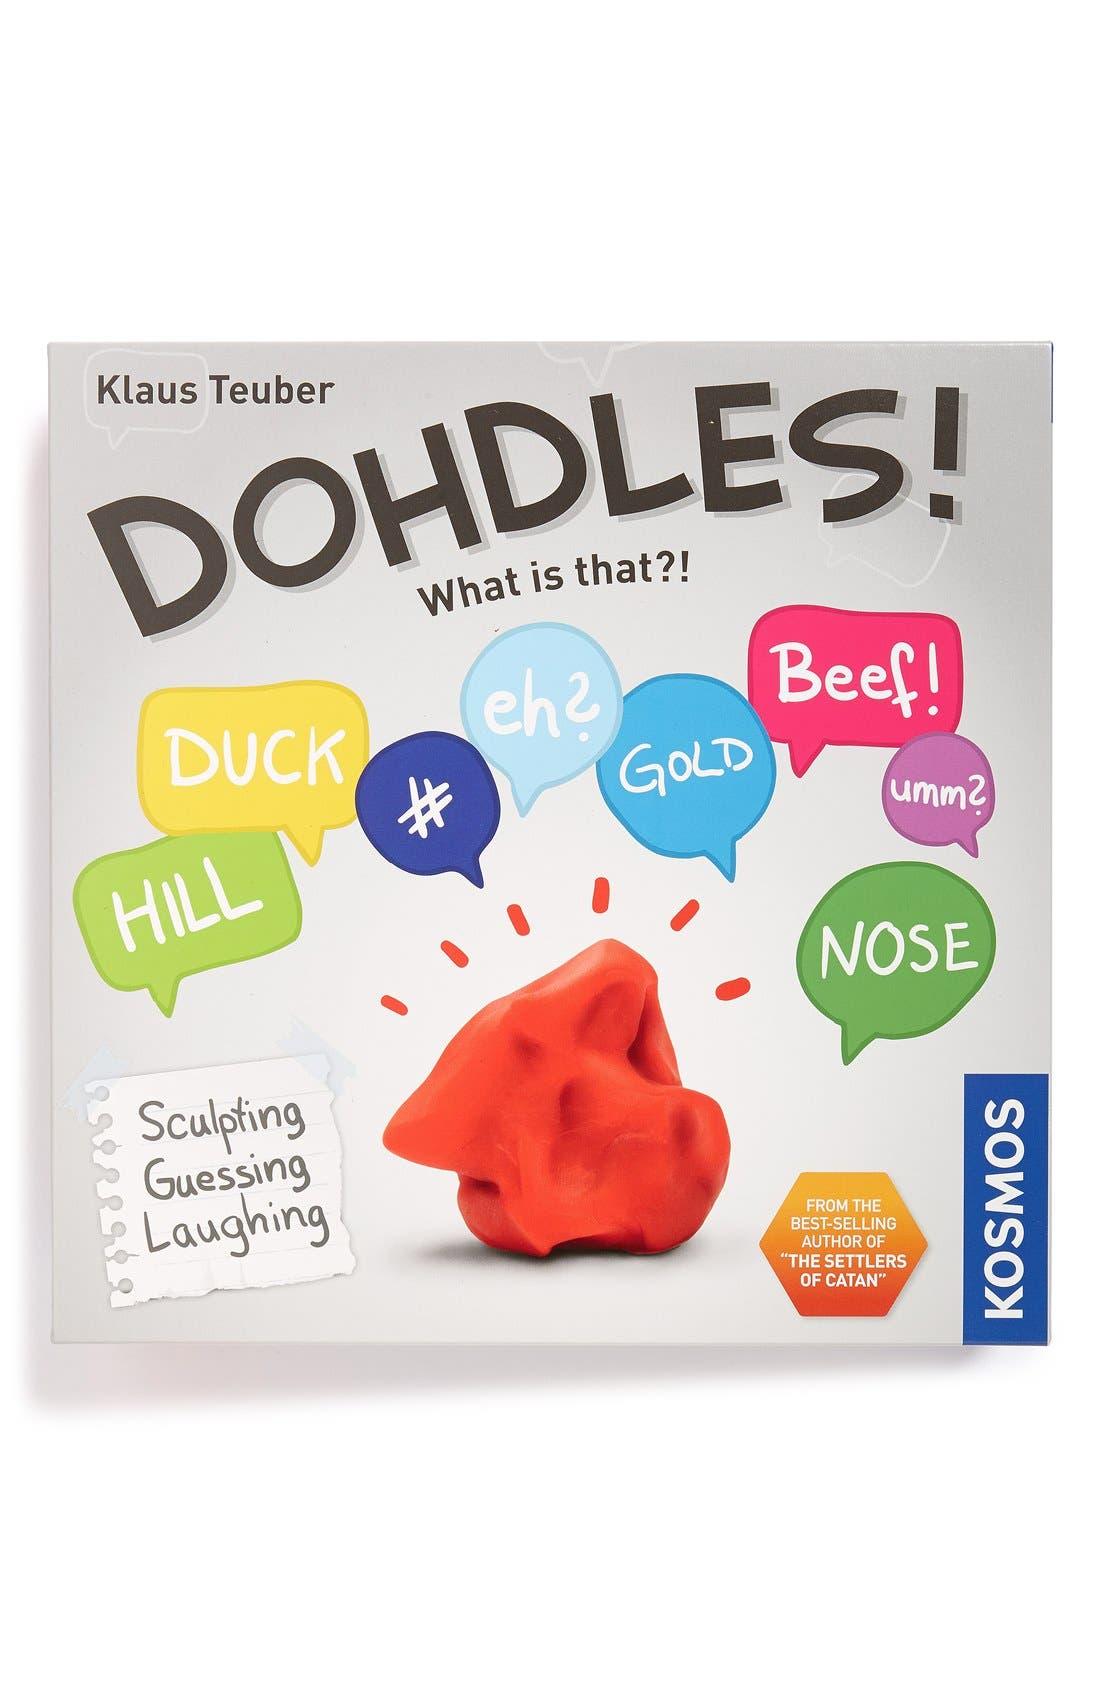 Thames & Kosmos 'Dohdles' Game